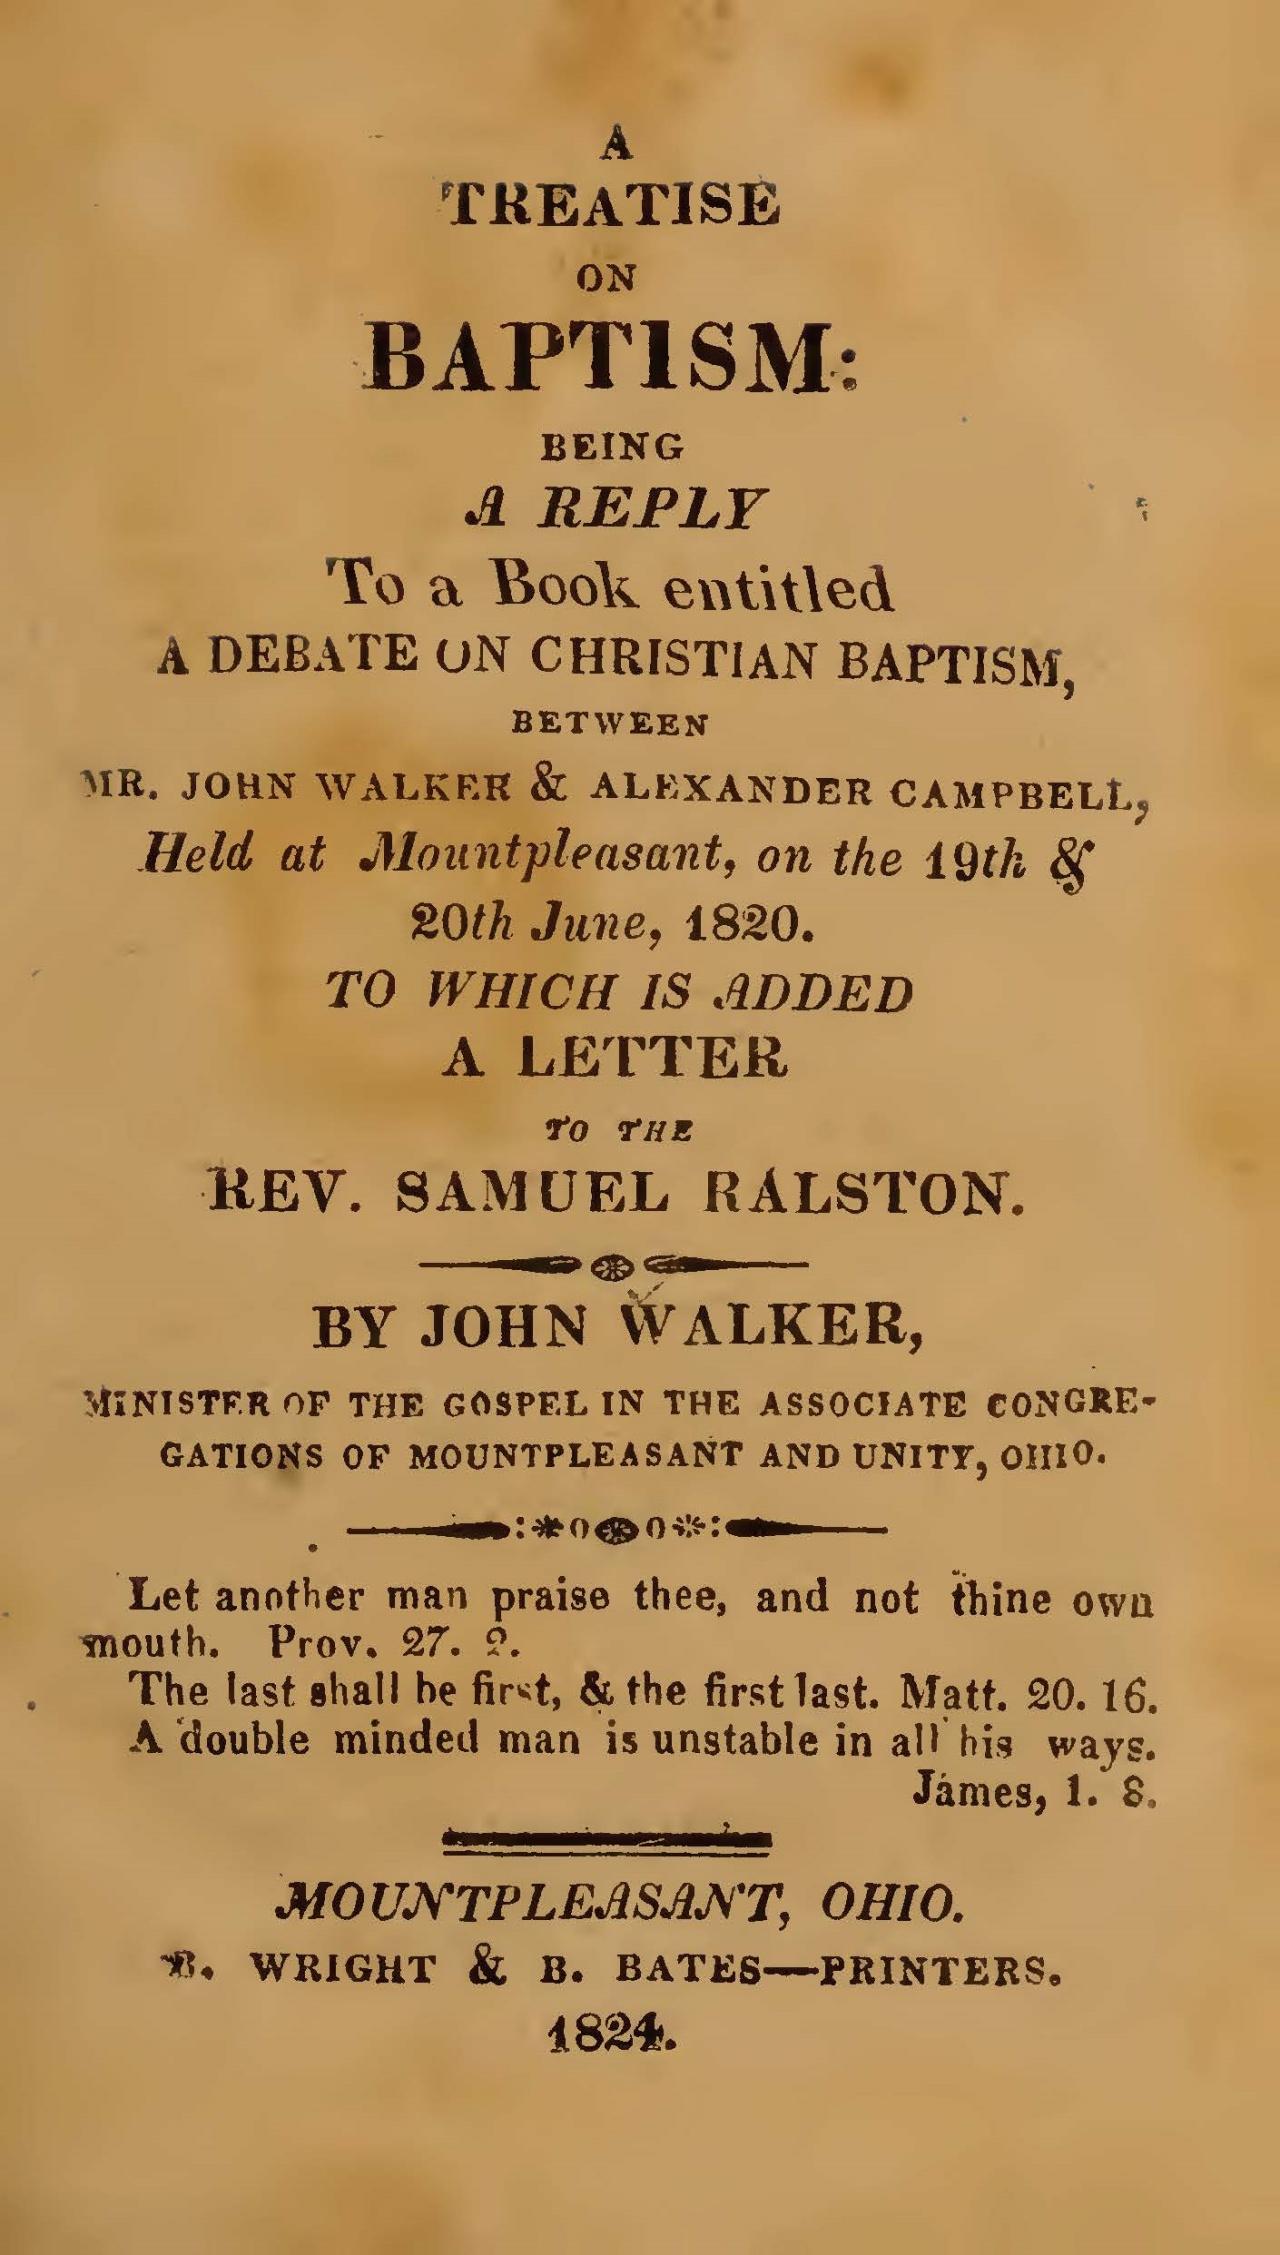 Walker, John, A Treatise on Baptism Title Page.jpg